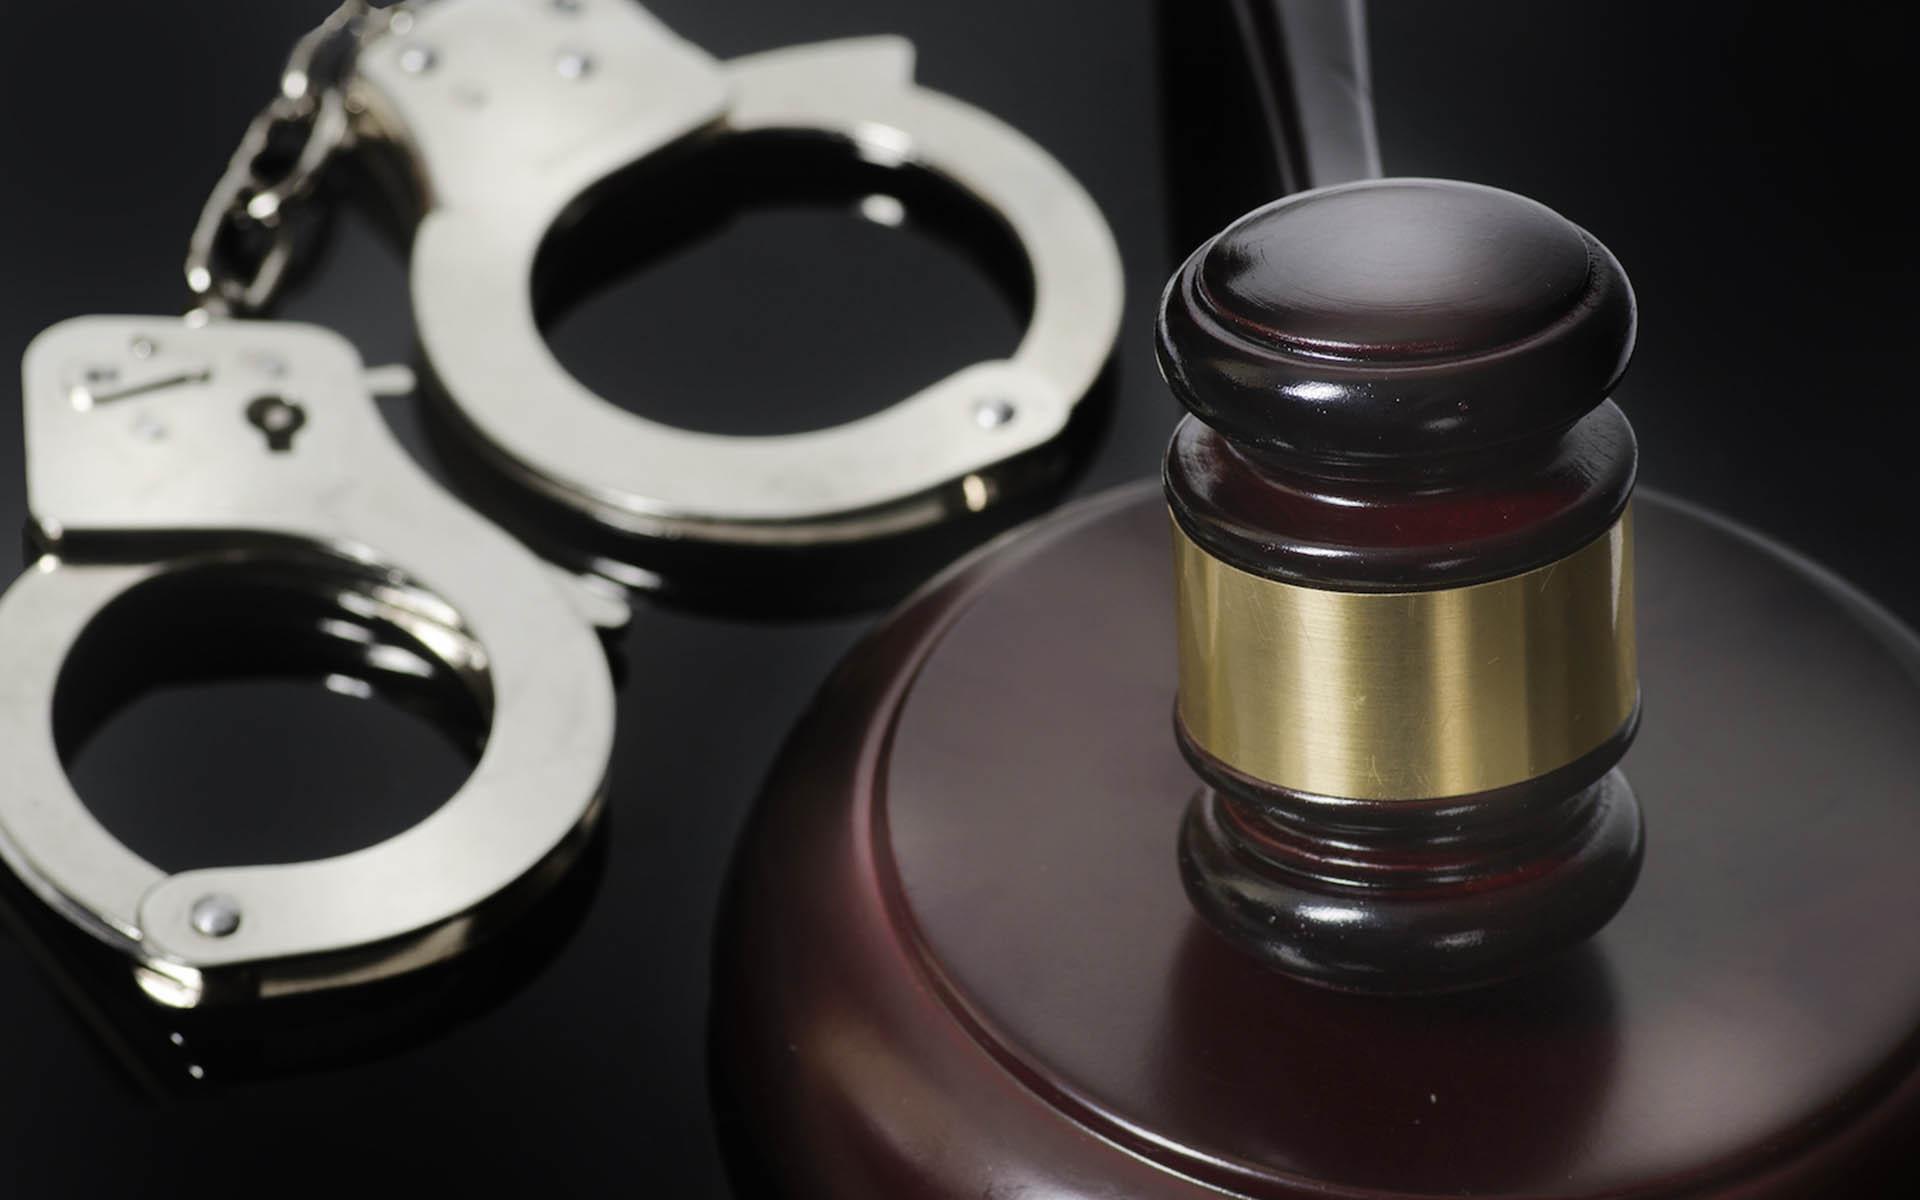 Pennsylvania Man Confesses to $40 Million Bitcoin Theft